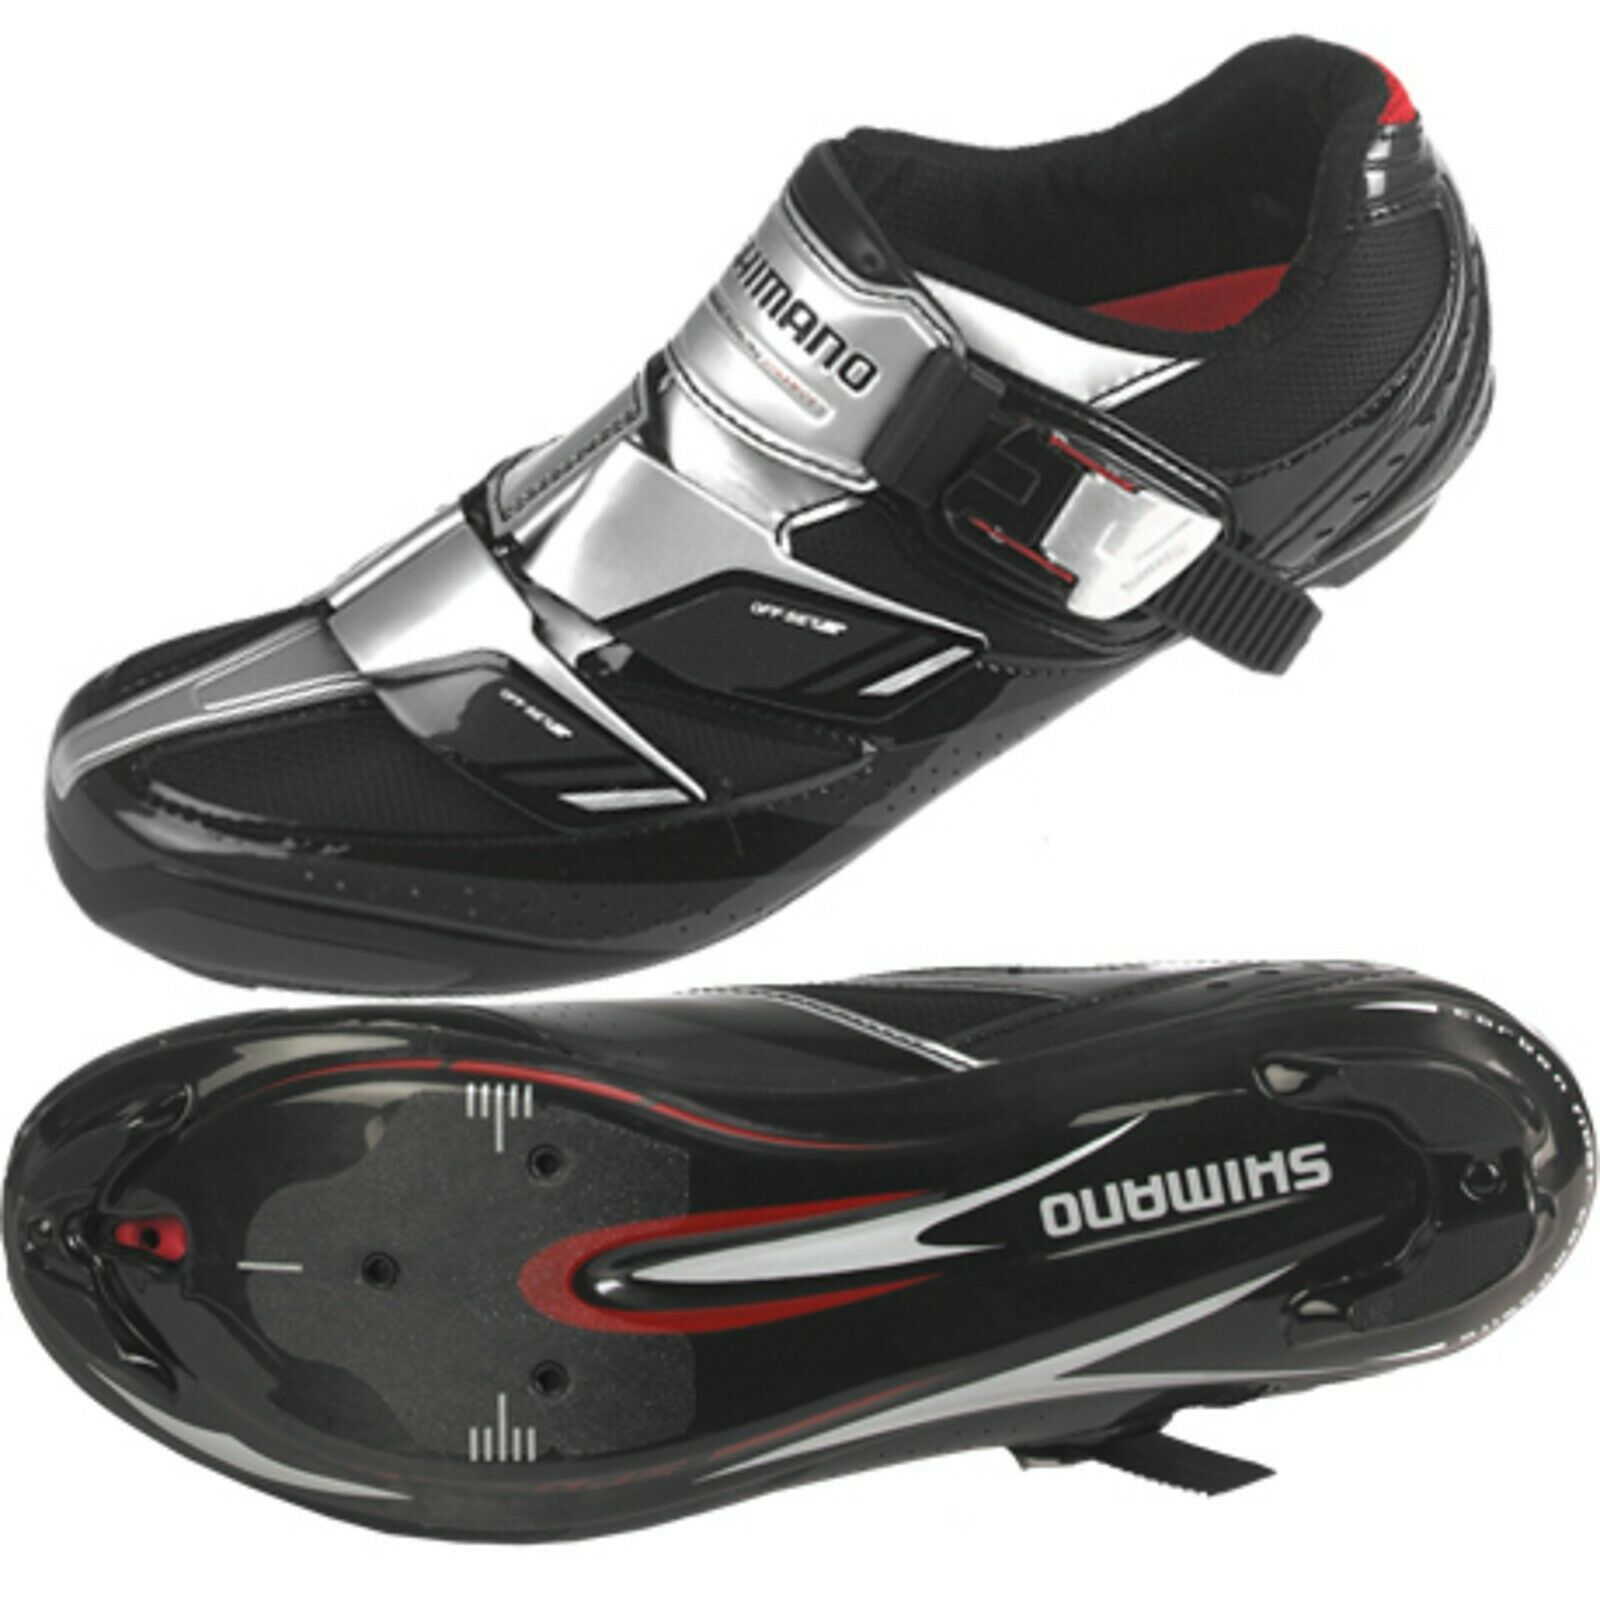 Shimano Elite Racing Zapato De Ciclismo SH-R191L Negro Plateado EU 42 US 8.3